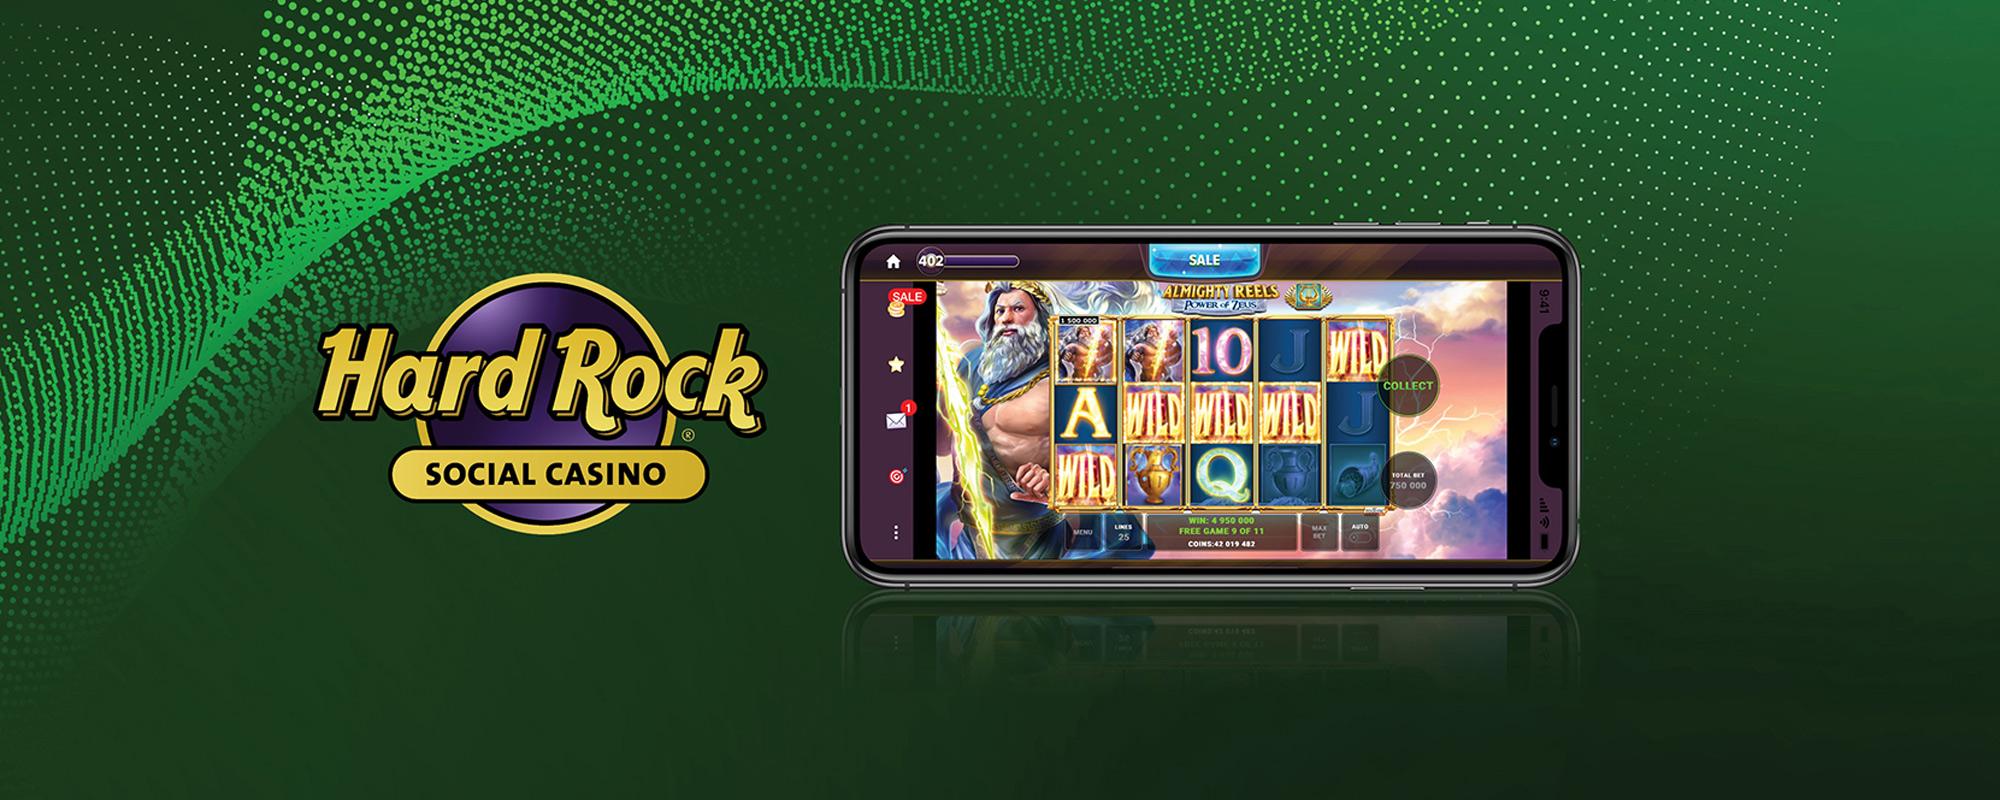 Play online at Hard Rock Social Casino